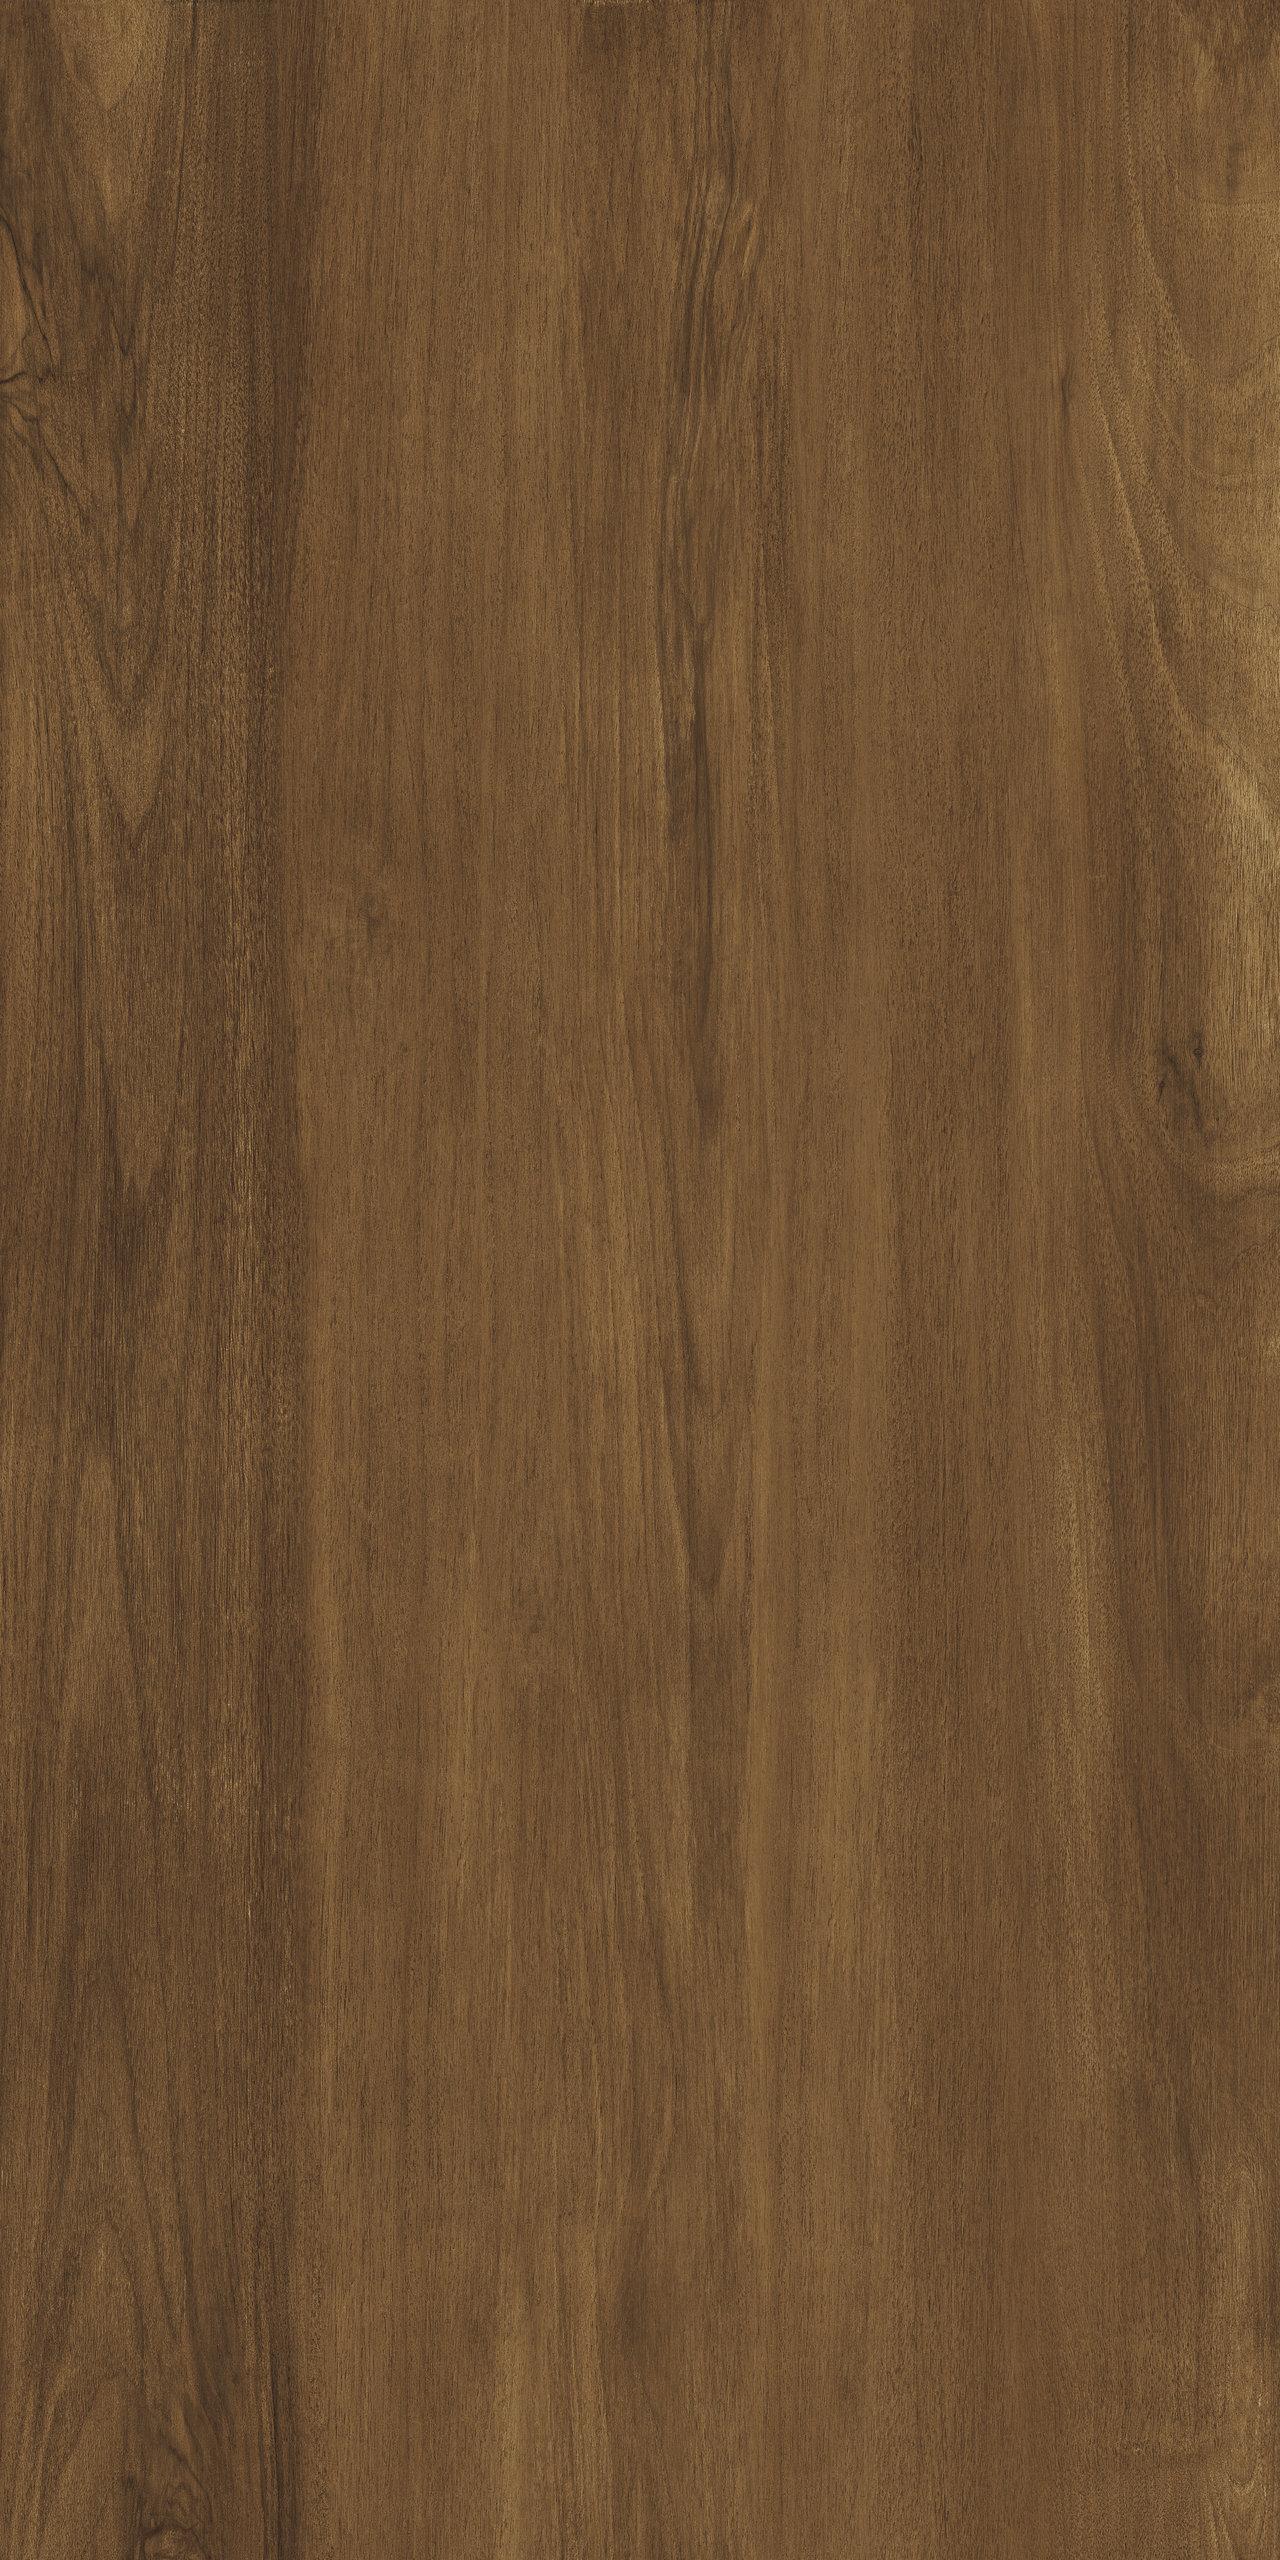 Infinite Wood sp iw spice nat 4812 f1 USG1248220